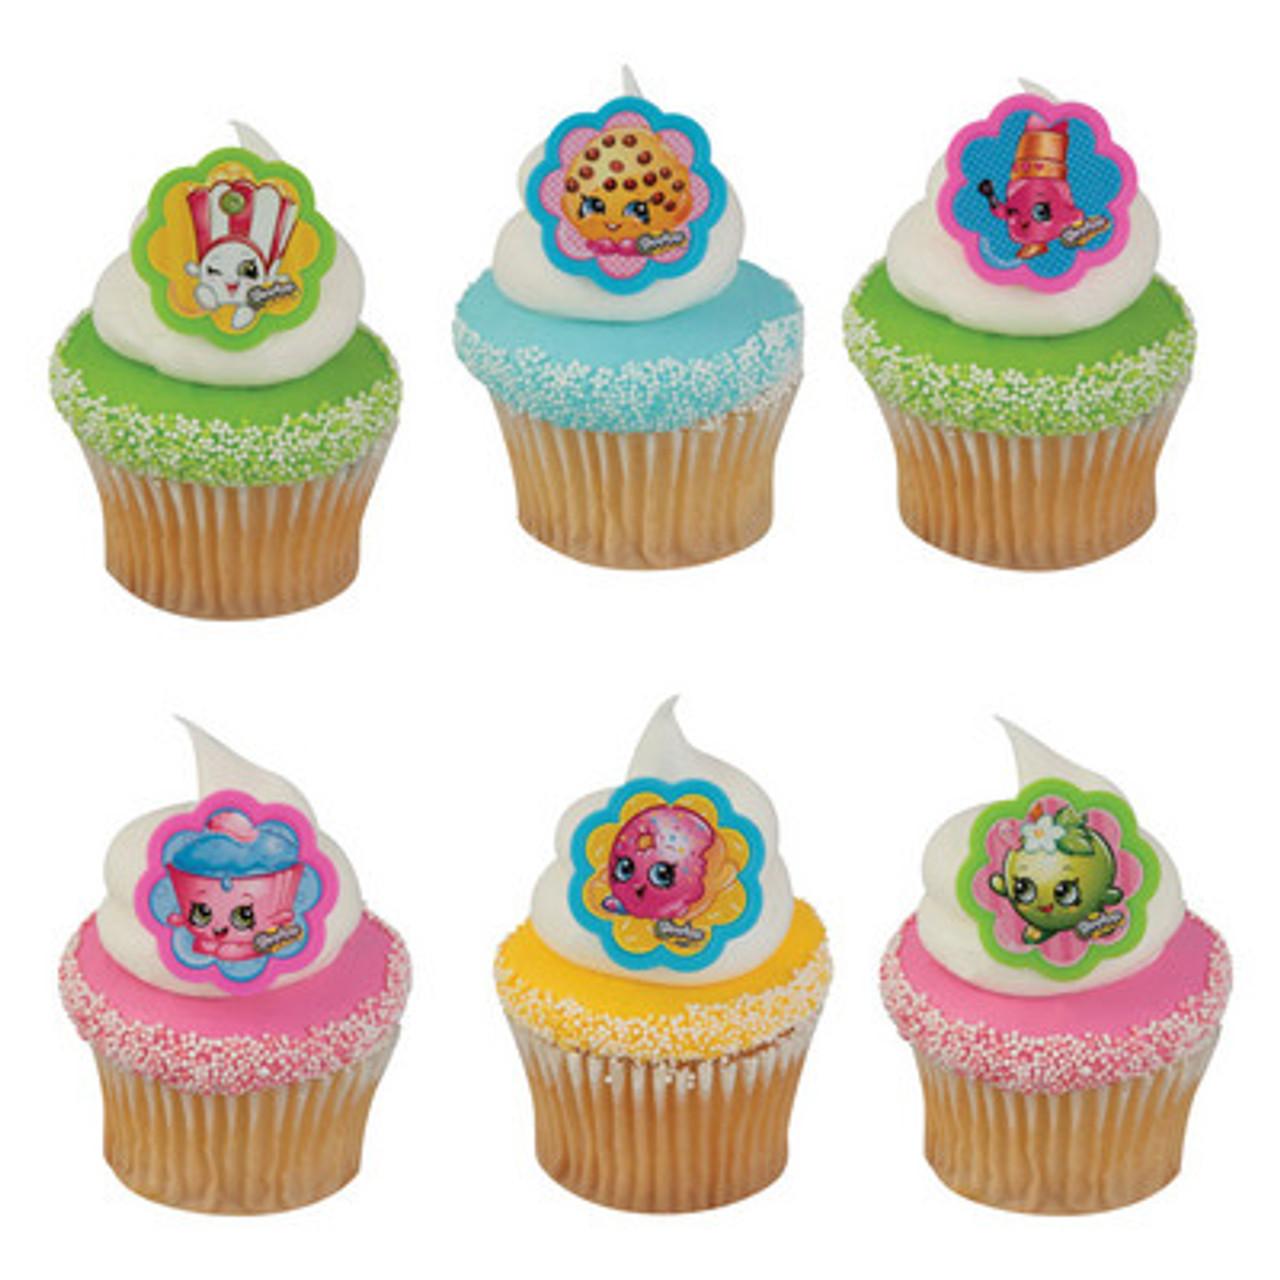 Shopkins Cake Or Cupcake Topper 6 Pc